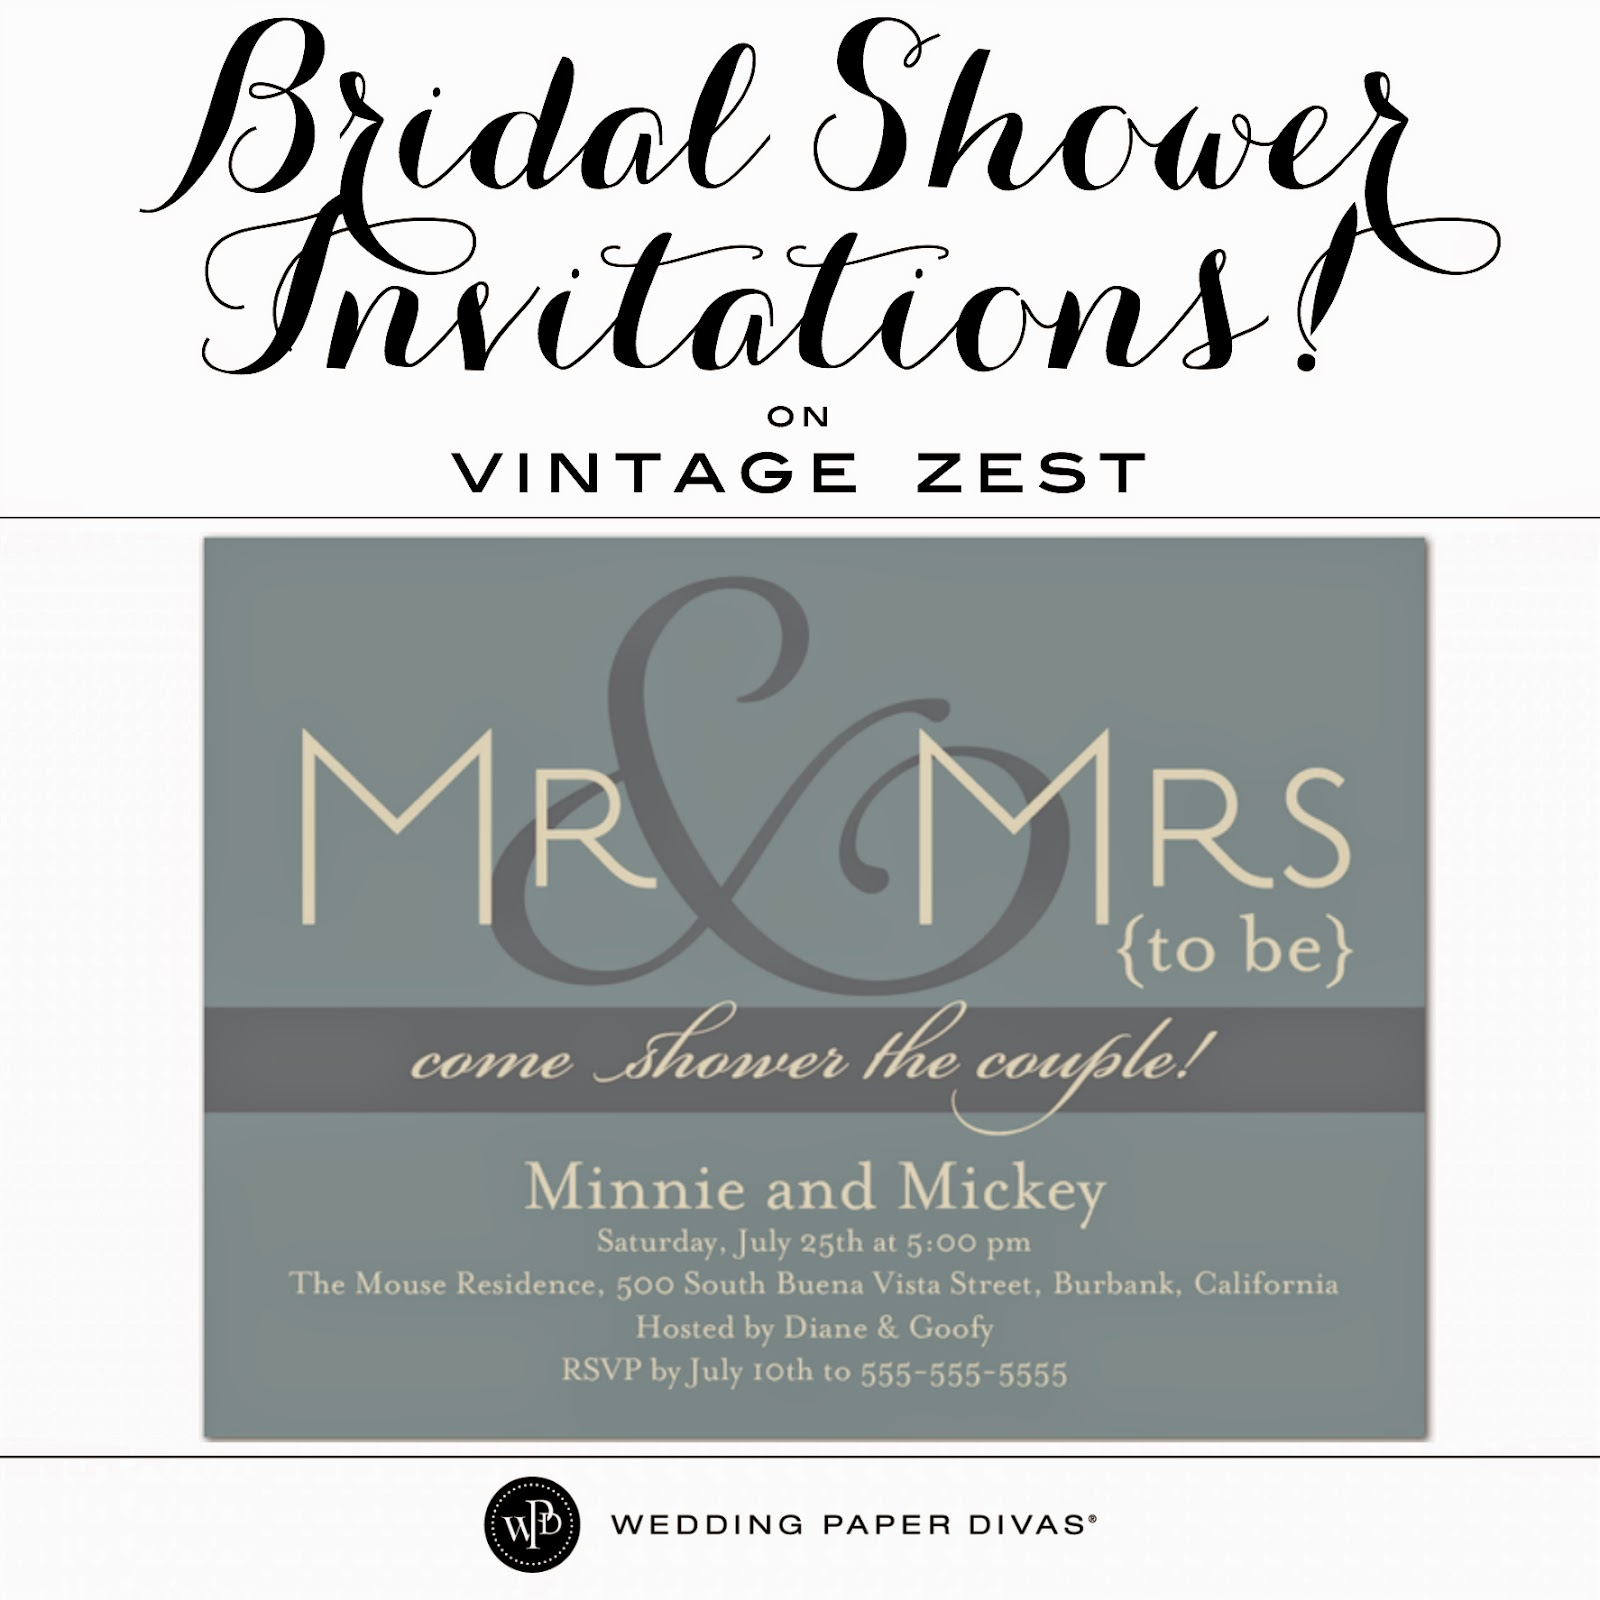 Bridal Shower Invitations on Diane's Vintage Zest!  #ad #WeddingPaperDivas #IC